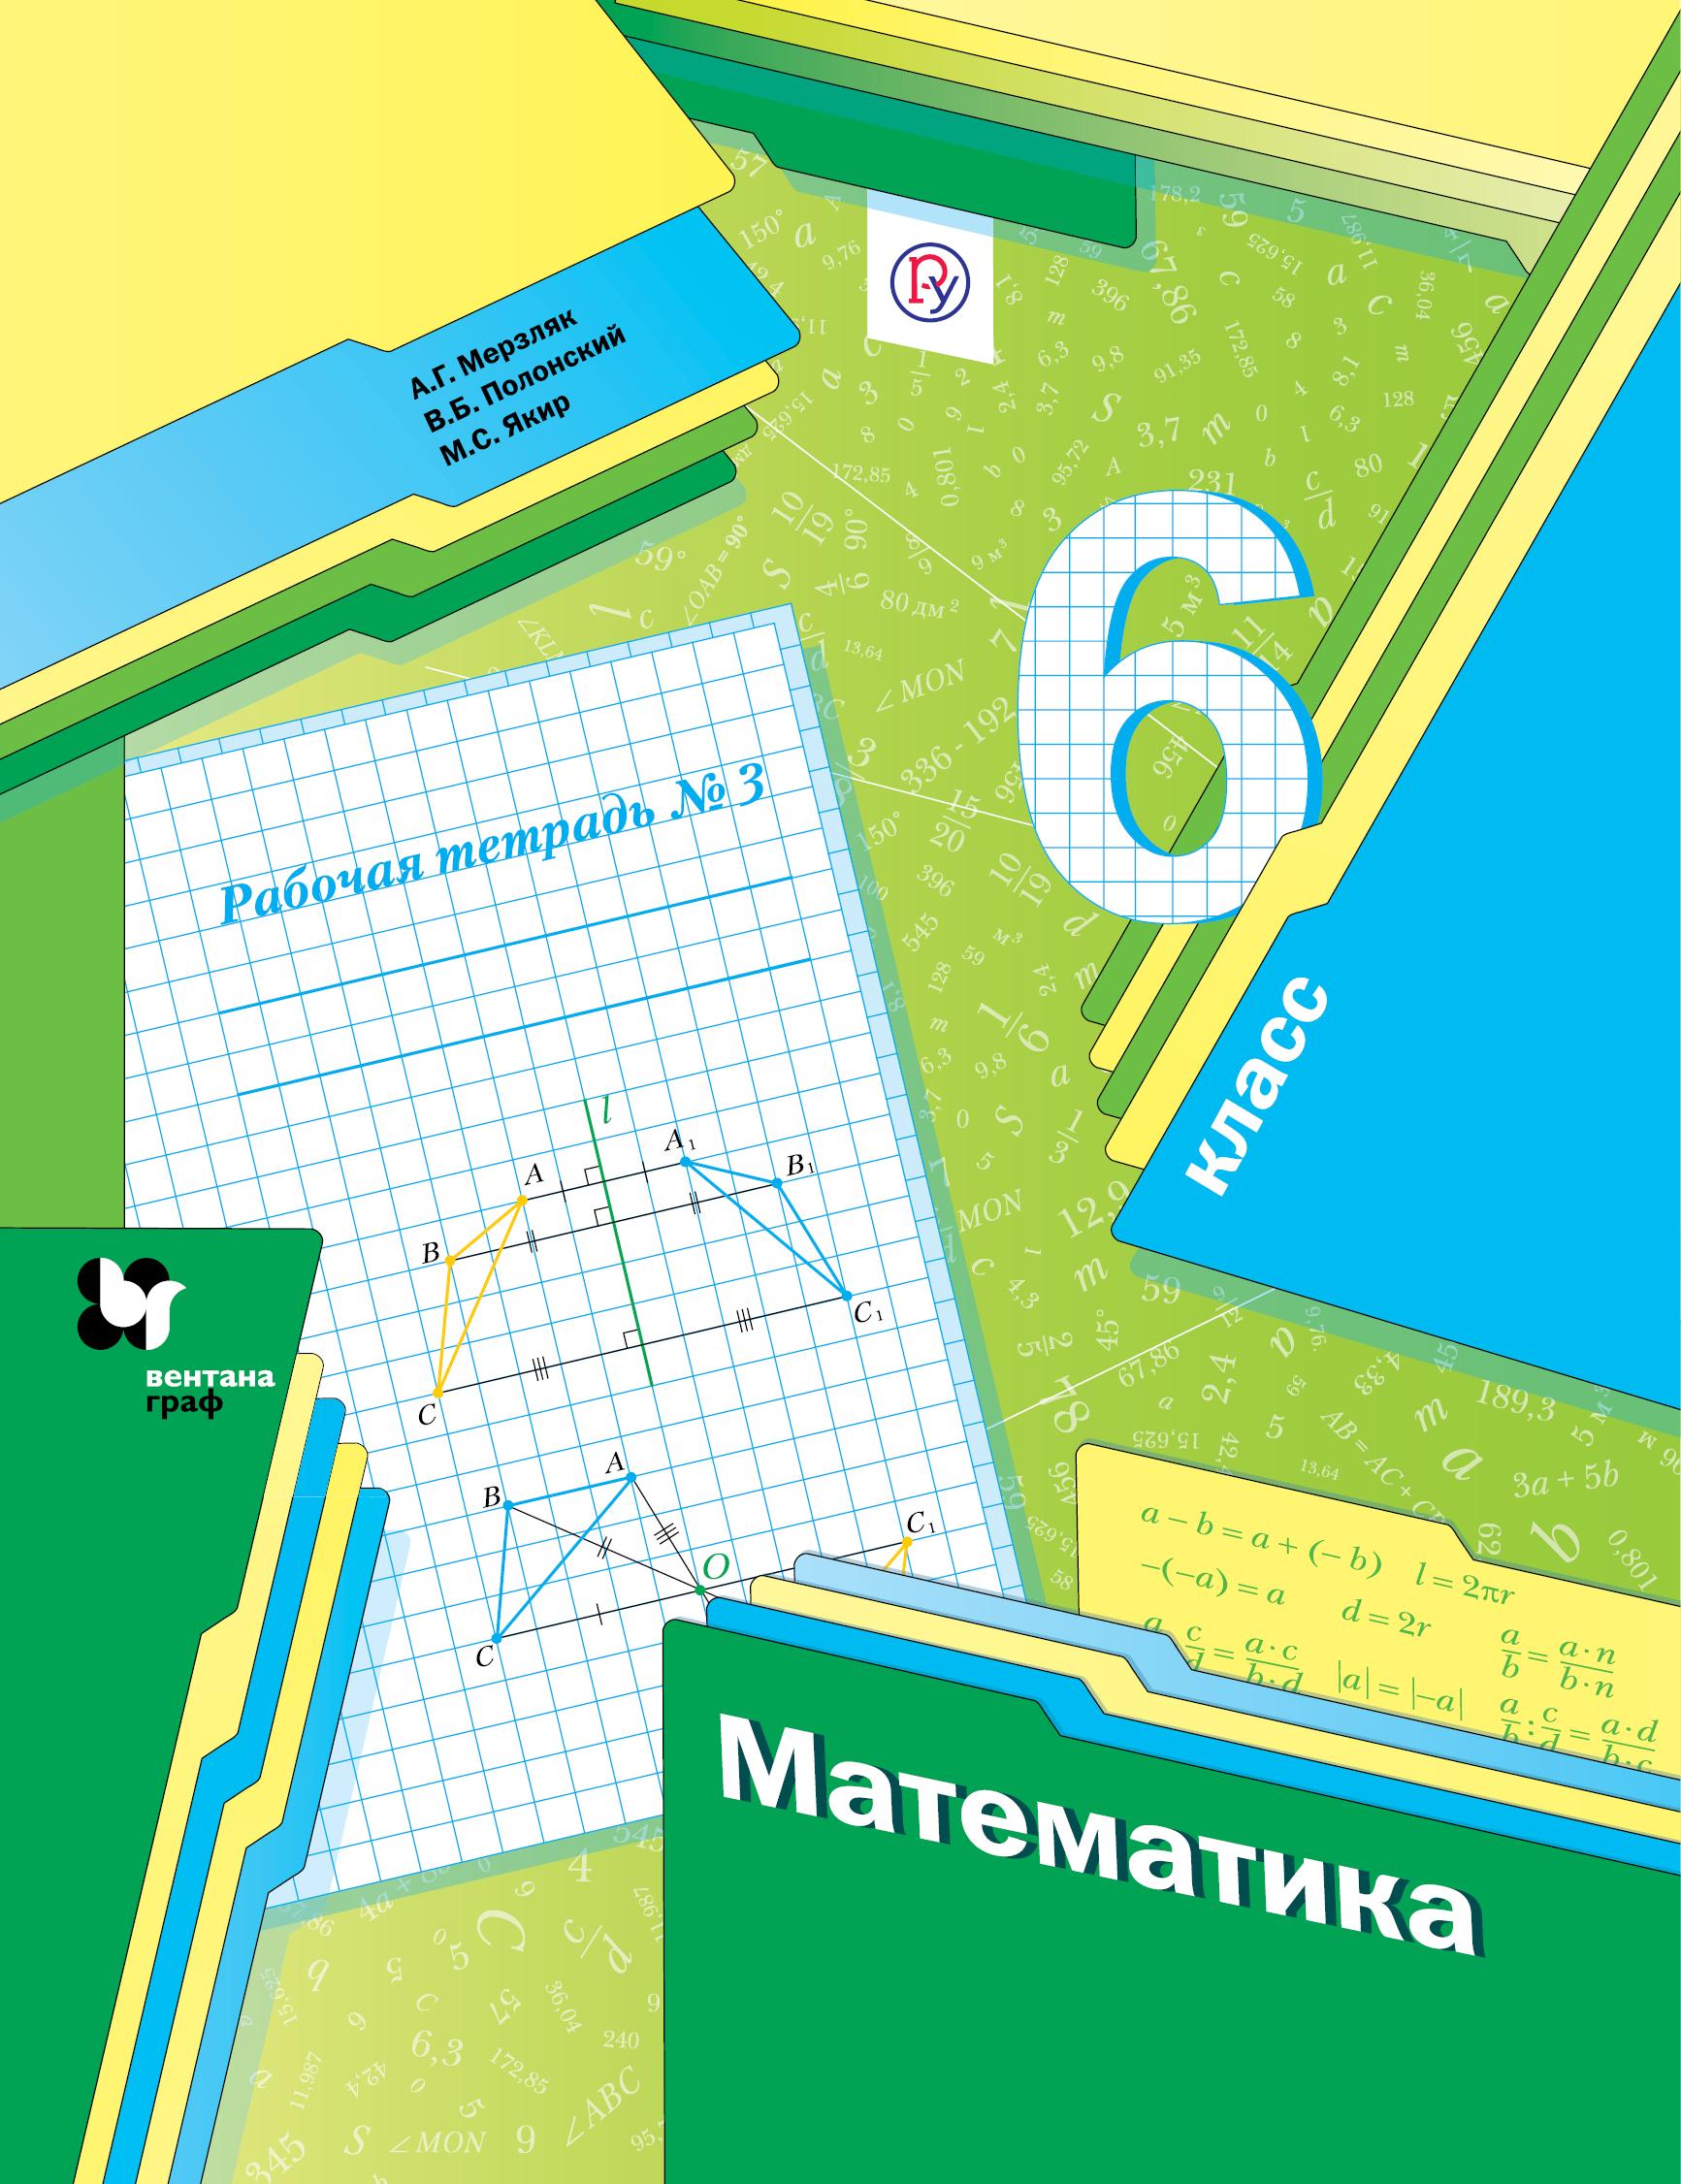 МерзлякА.Г., ПолонскийВ.Б., ЯкирМ.С. Математика. 6класс. Рабочая тетрадь №3. цена